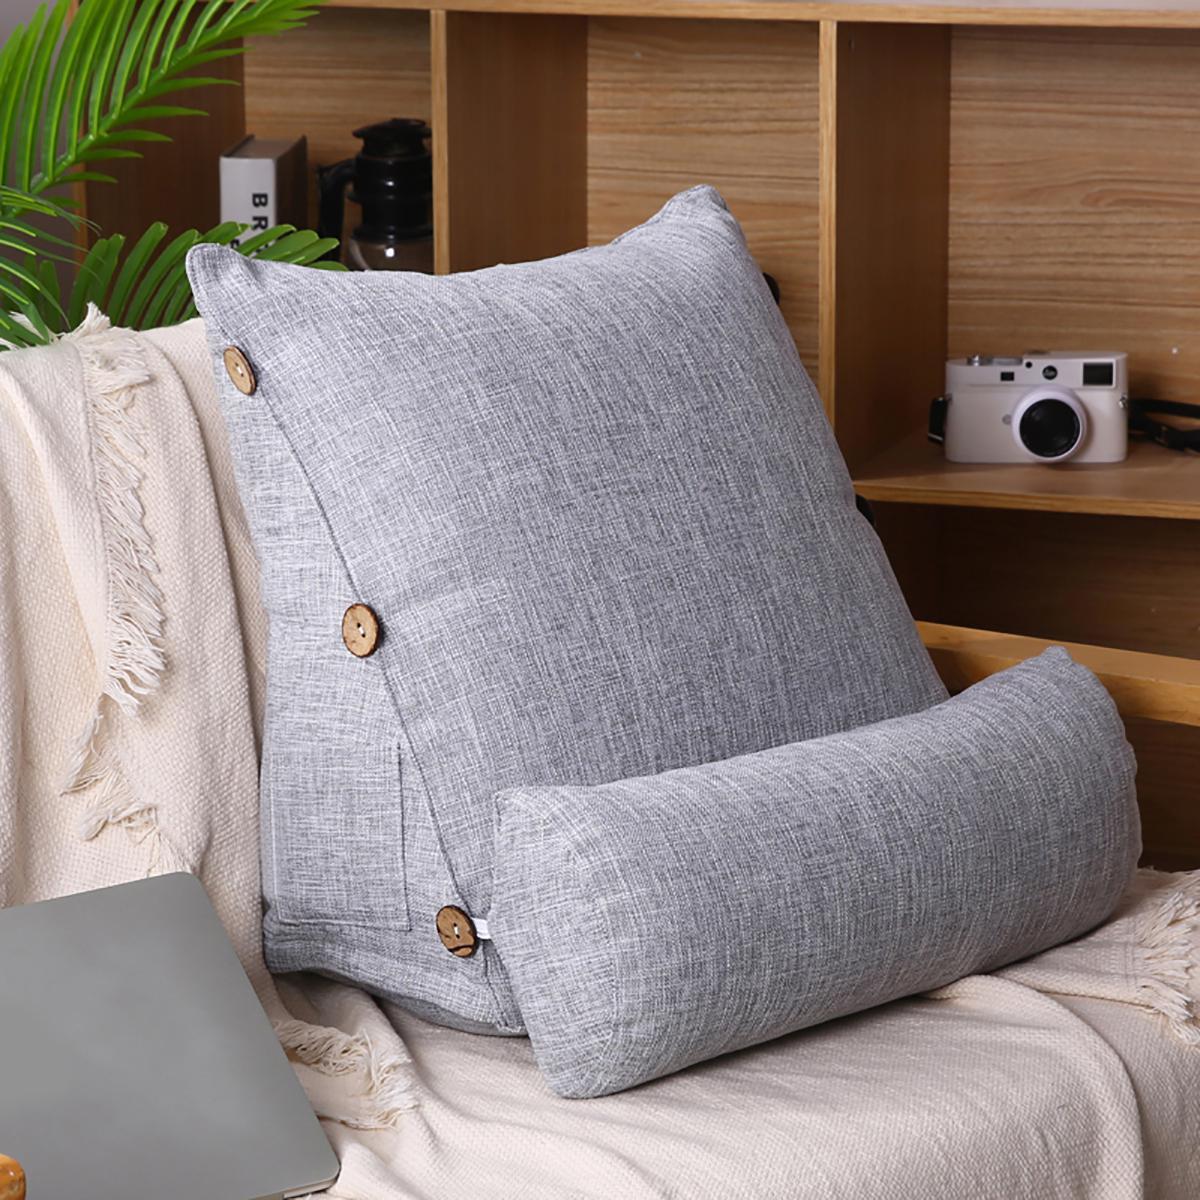 18/'/' Triangular Wedge Back Pillow Rest Neck Home Sofa Bed Lumbar Office Rest